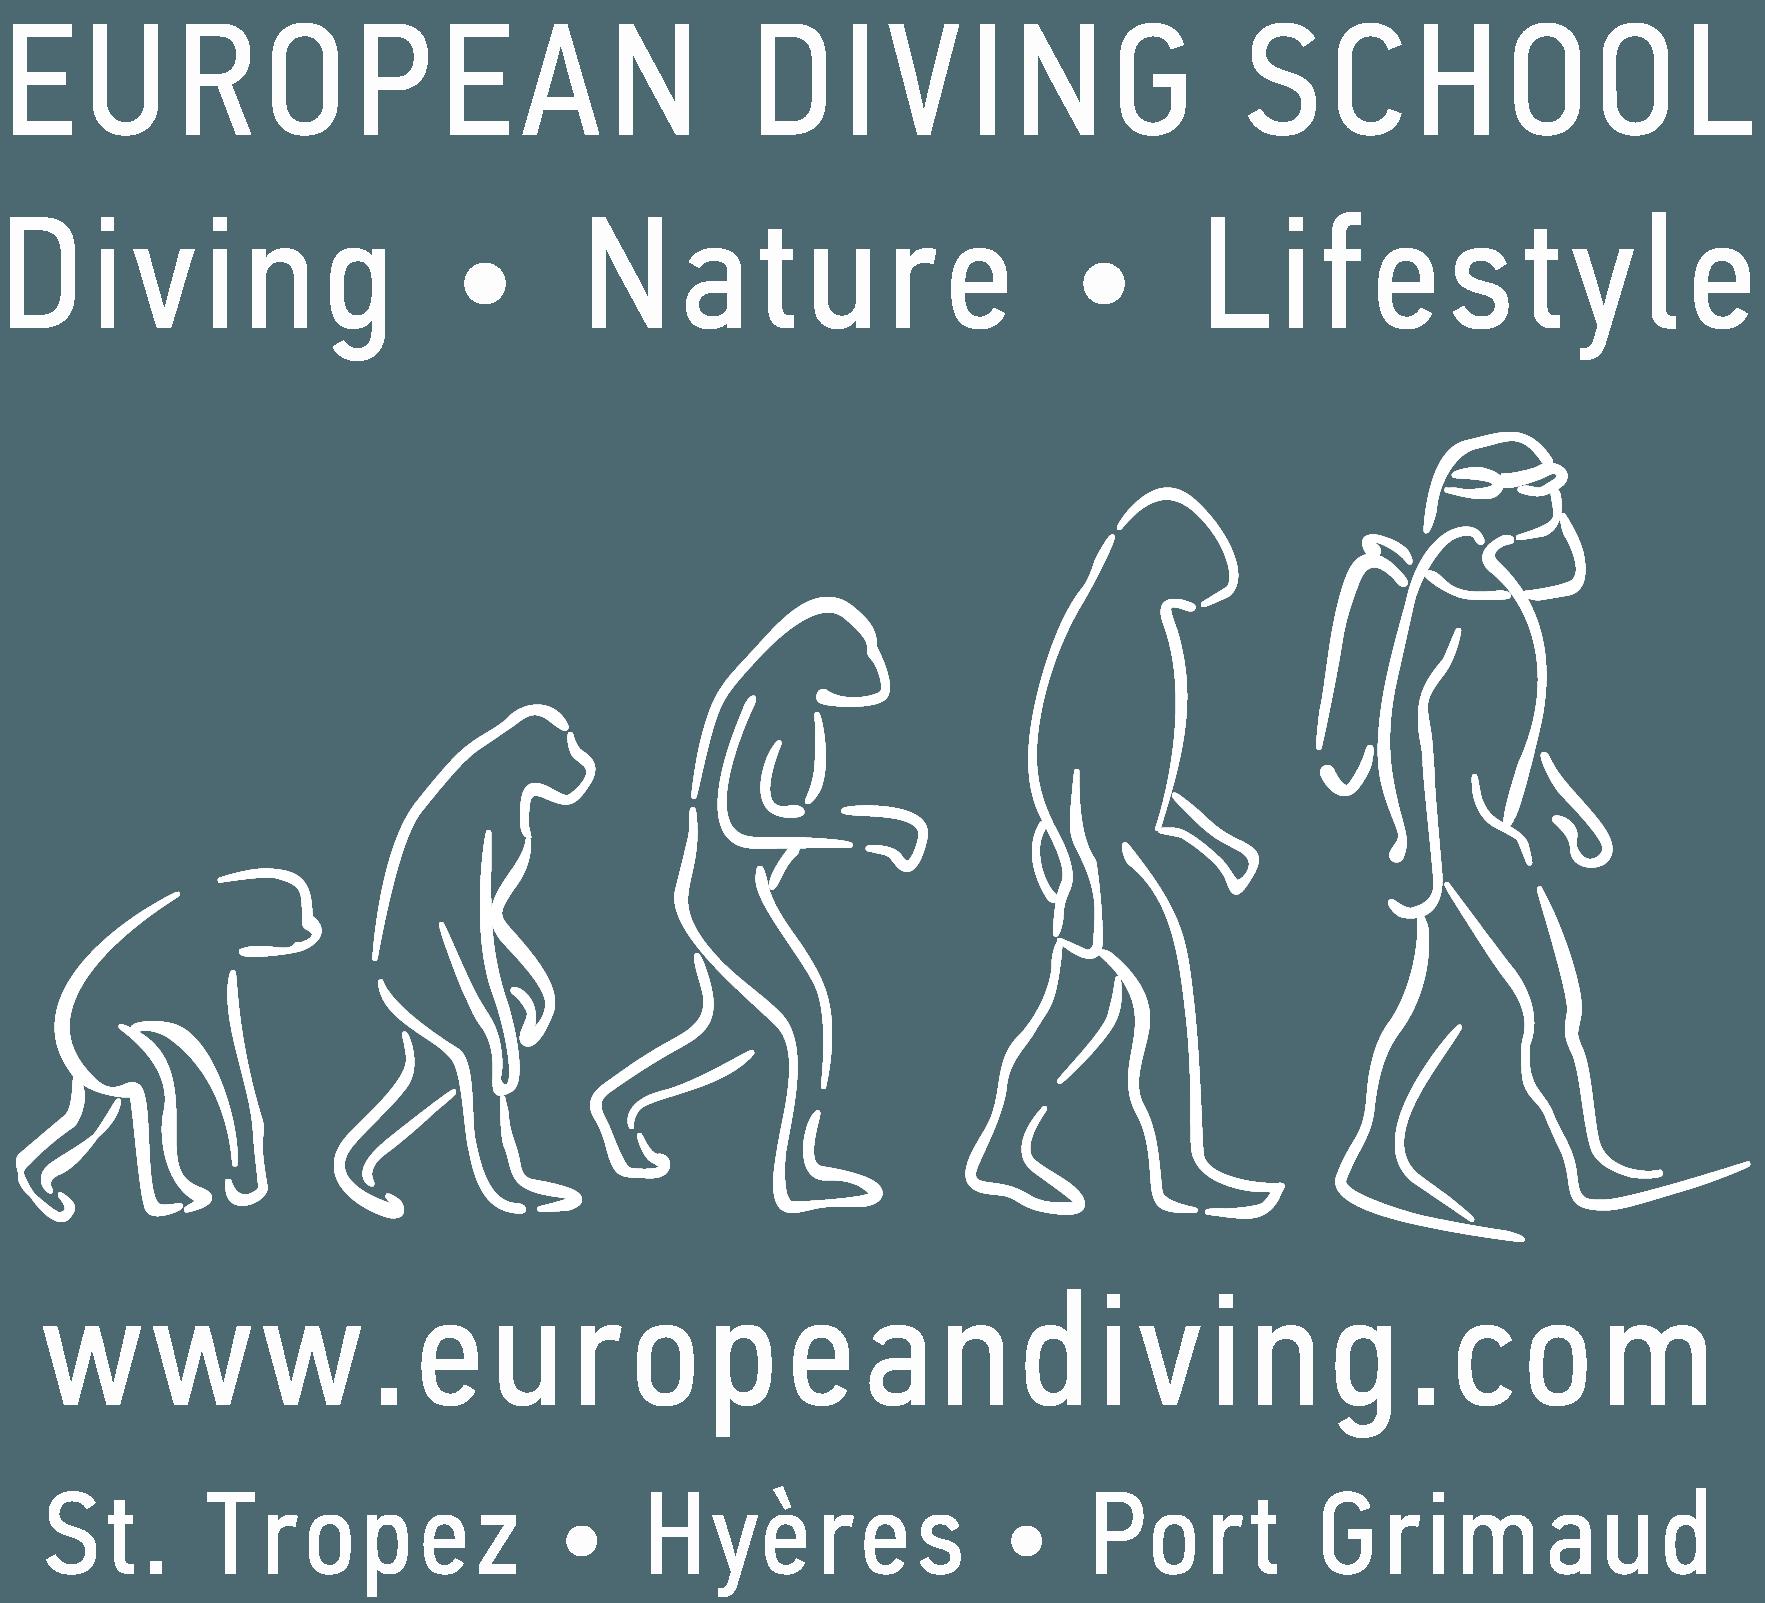 151219 logo shirt 02 - European Diving School